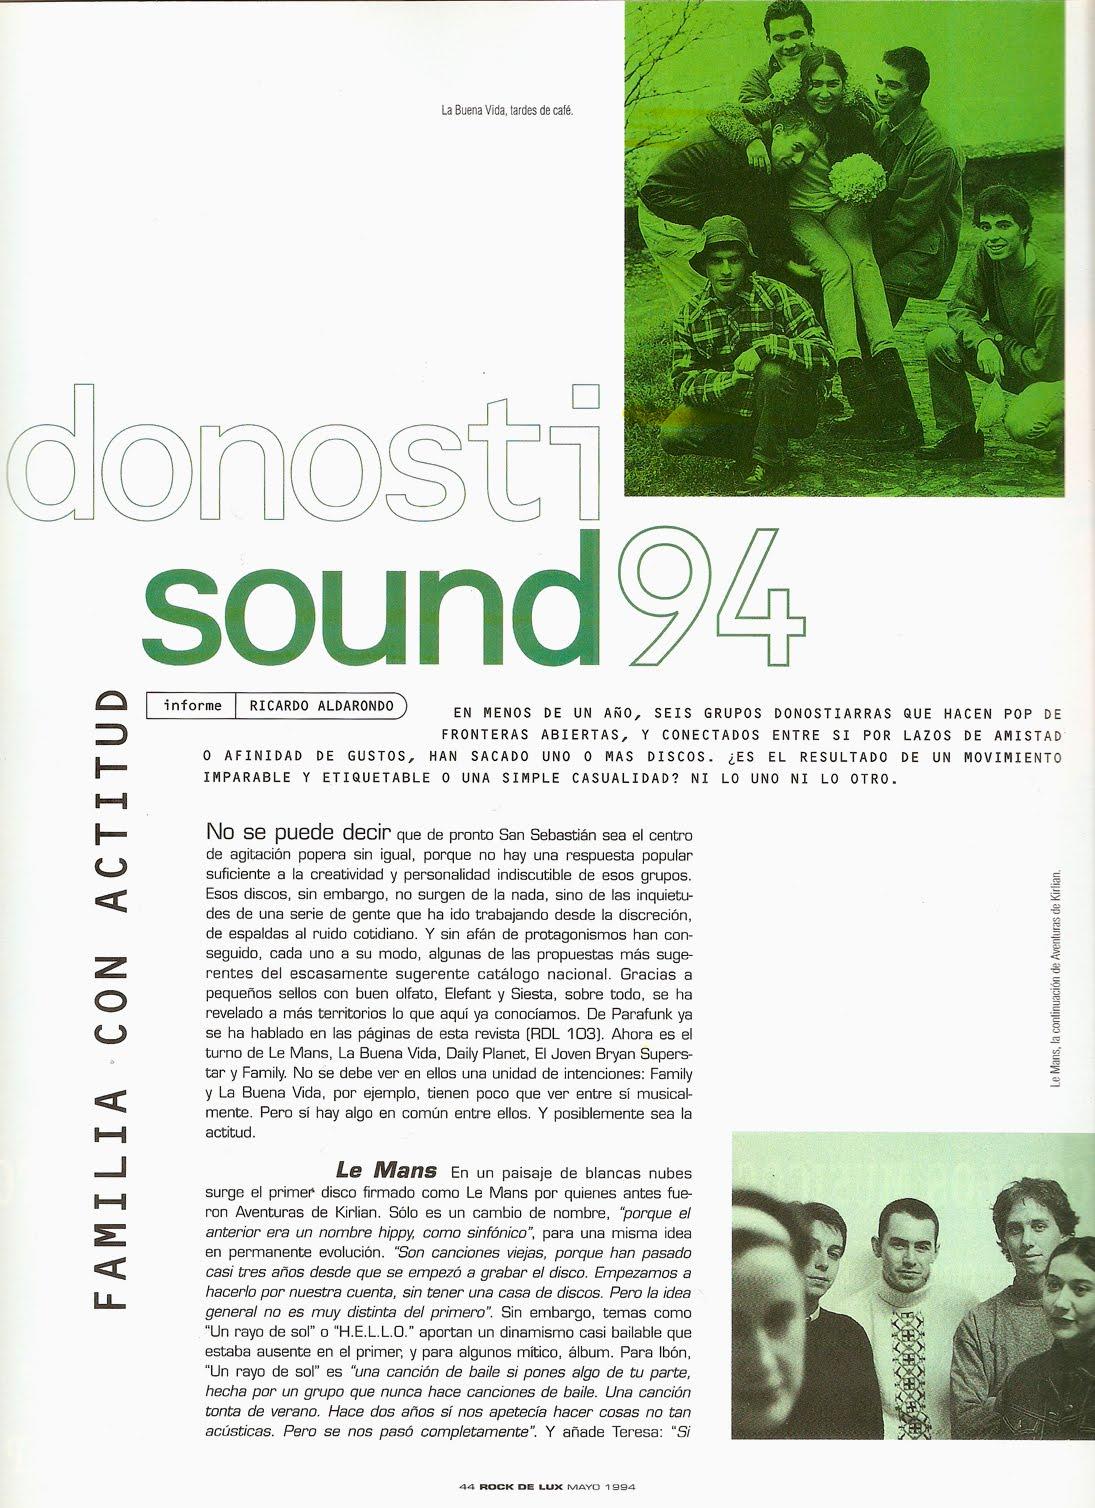 Donosti Sound - Family, La Buena Vida, Le Mans, Aventuras de Kirlian Informe-donosti-sound-rockdelux-108-mayo-1994-1